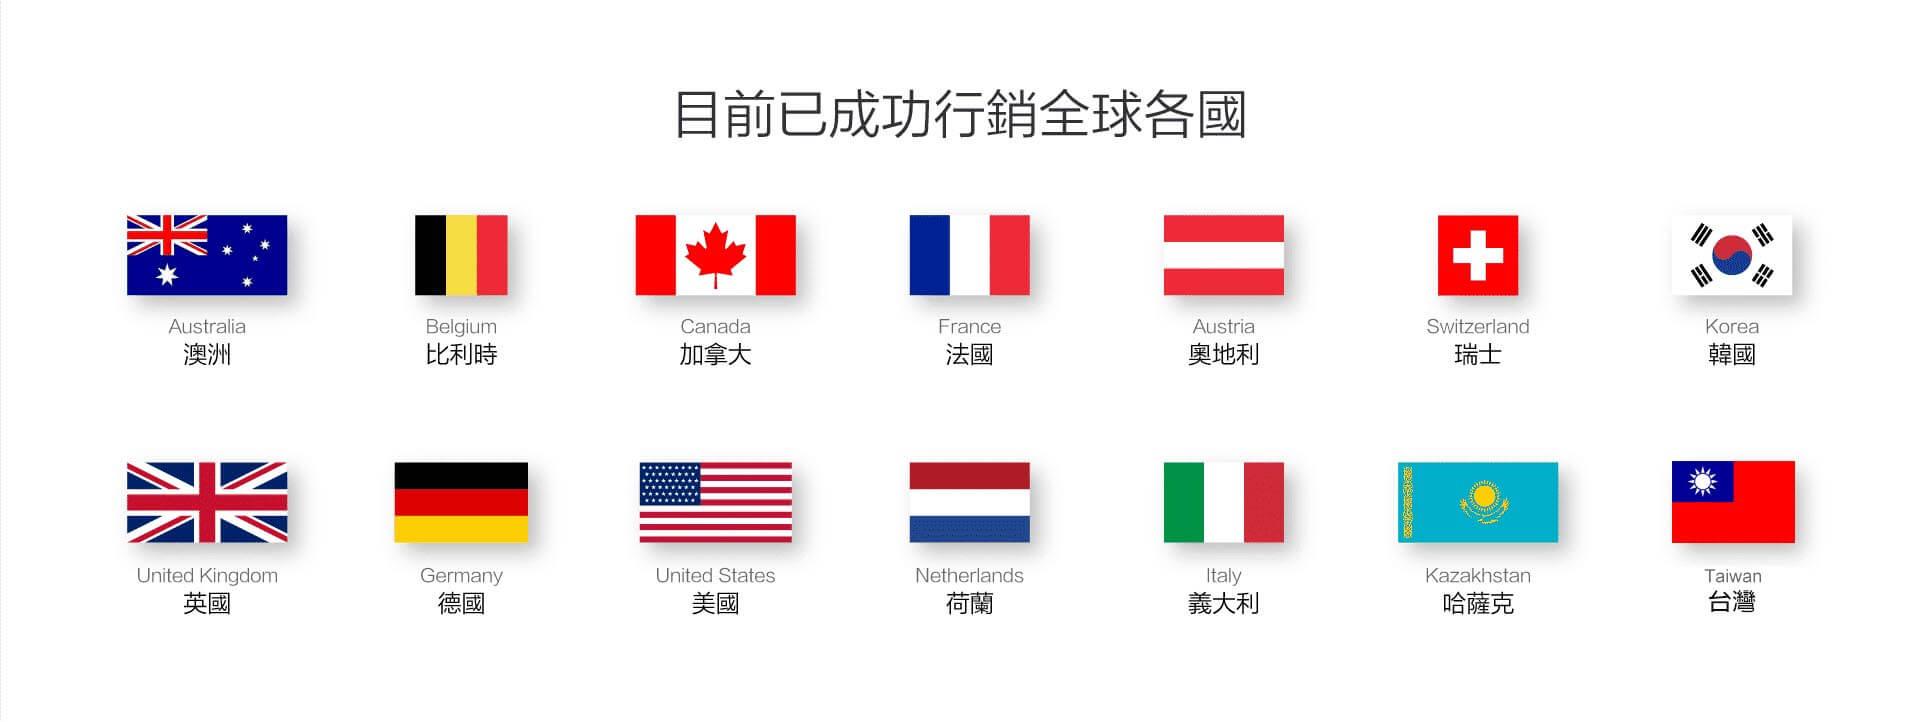 Poll-tex防霾紗窗目前已成功行銷世界各國